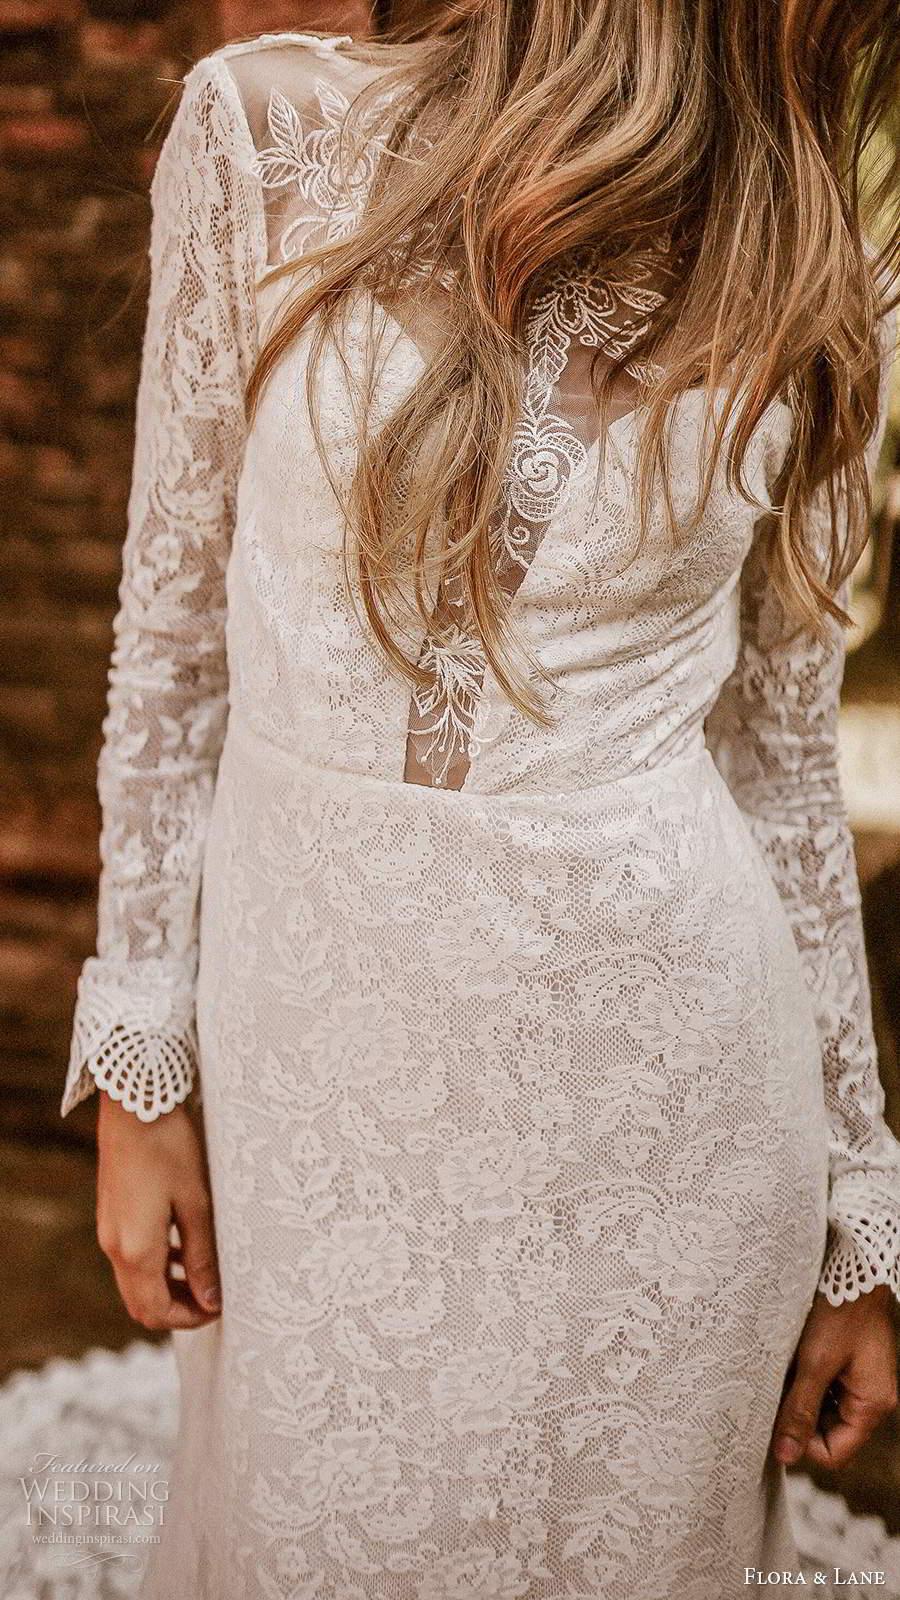 flora and lane 2019 bridal long sleeves bateau neckline fully embellished lace boho romantic mermaid sheath wedding dress v back chapel train (5) zv